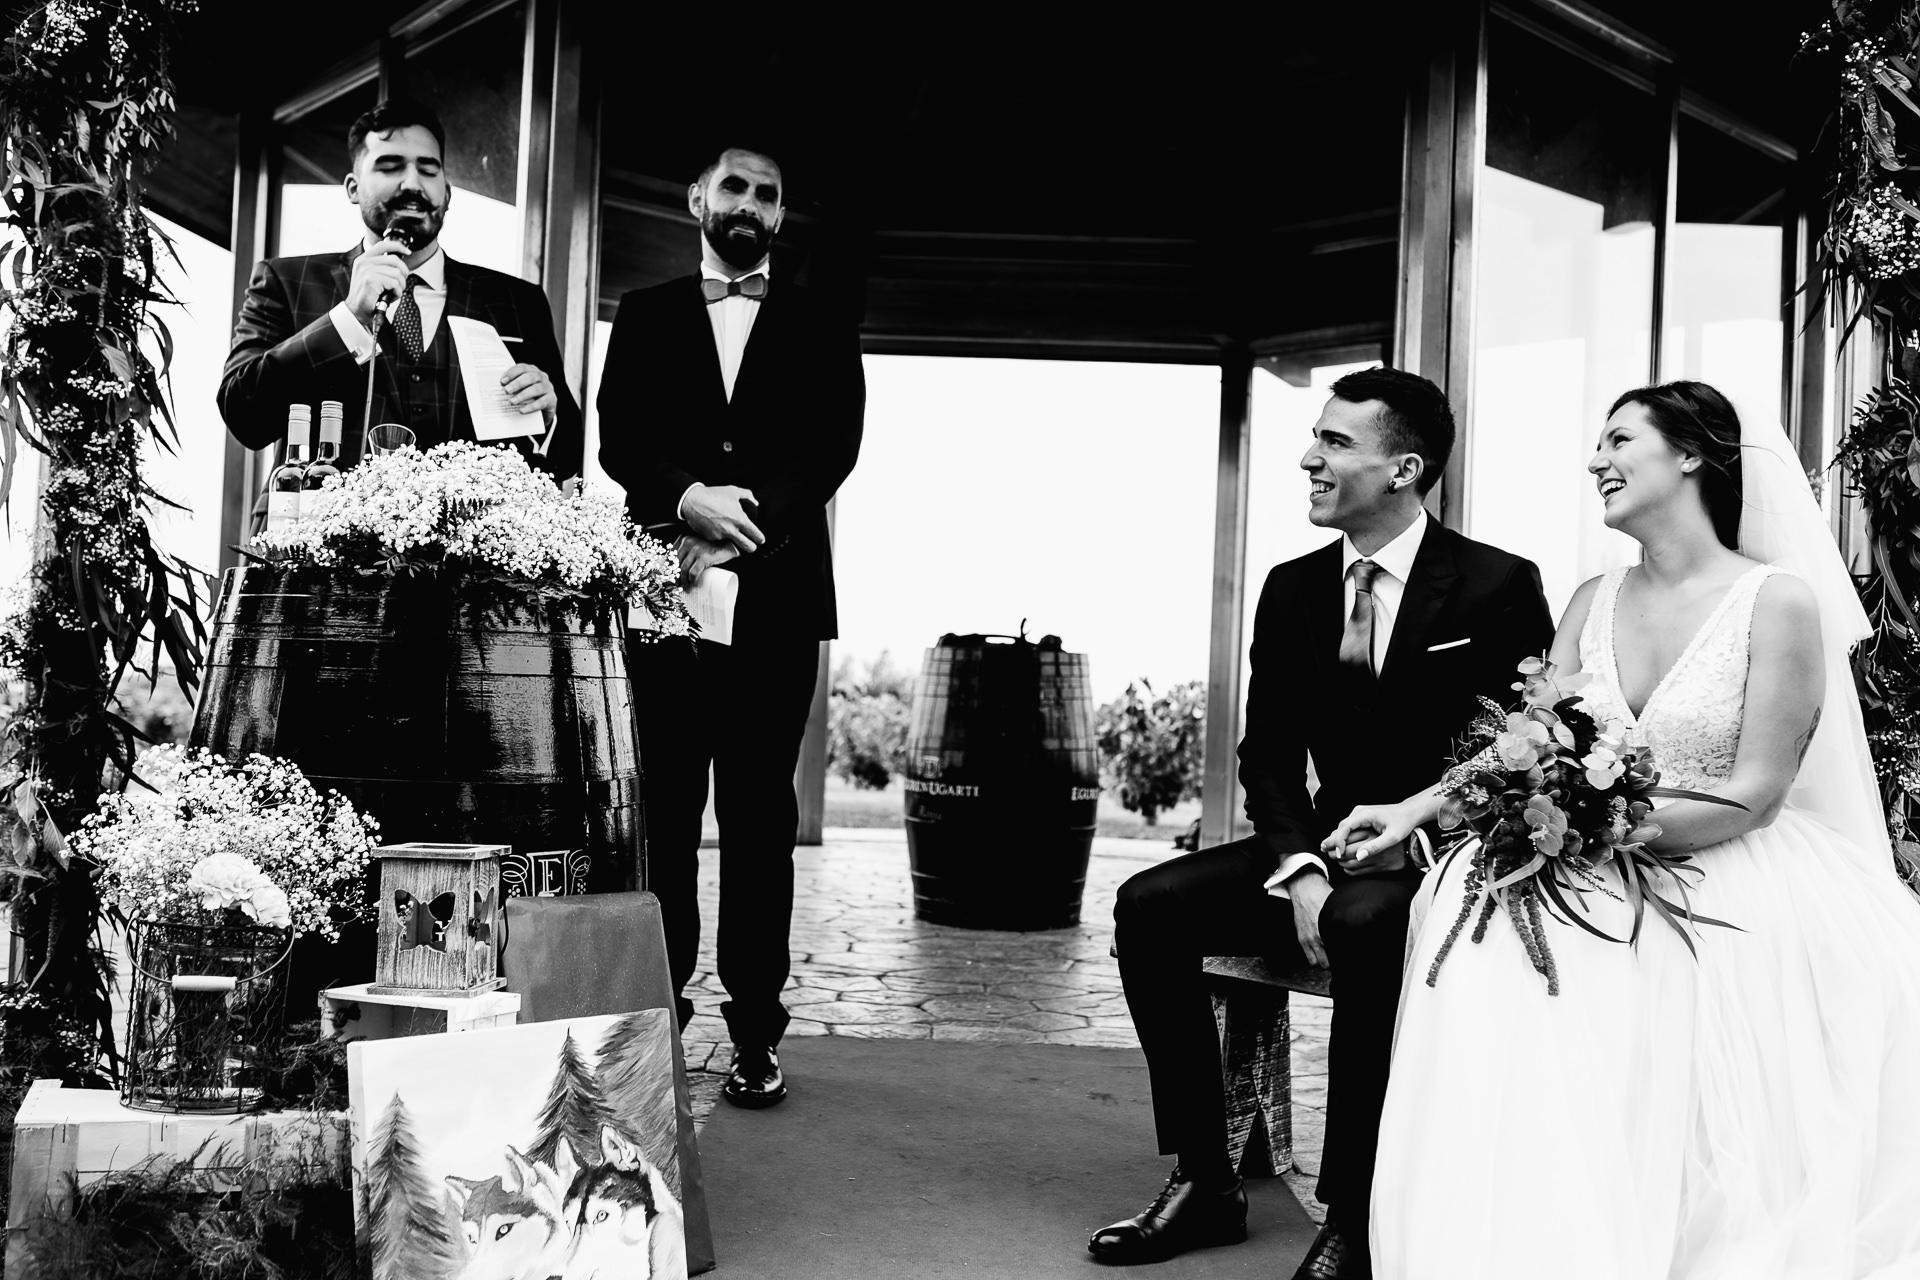 boda civil eguren ugarte larioja 135956